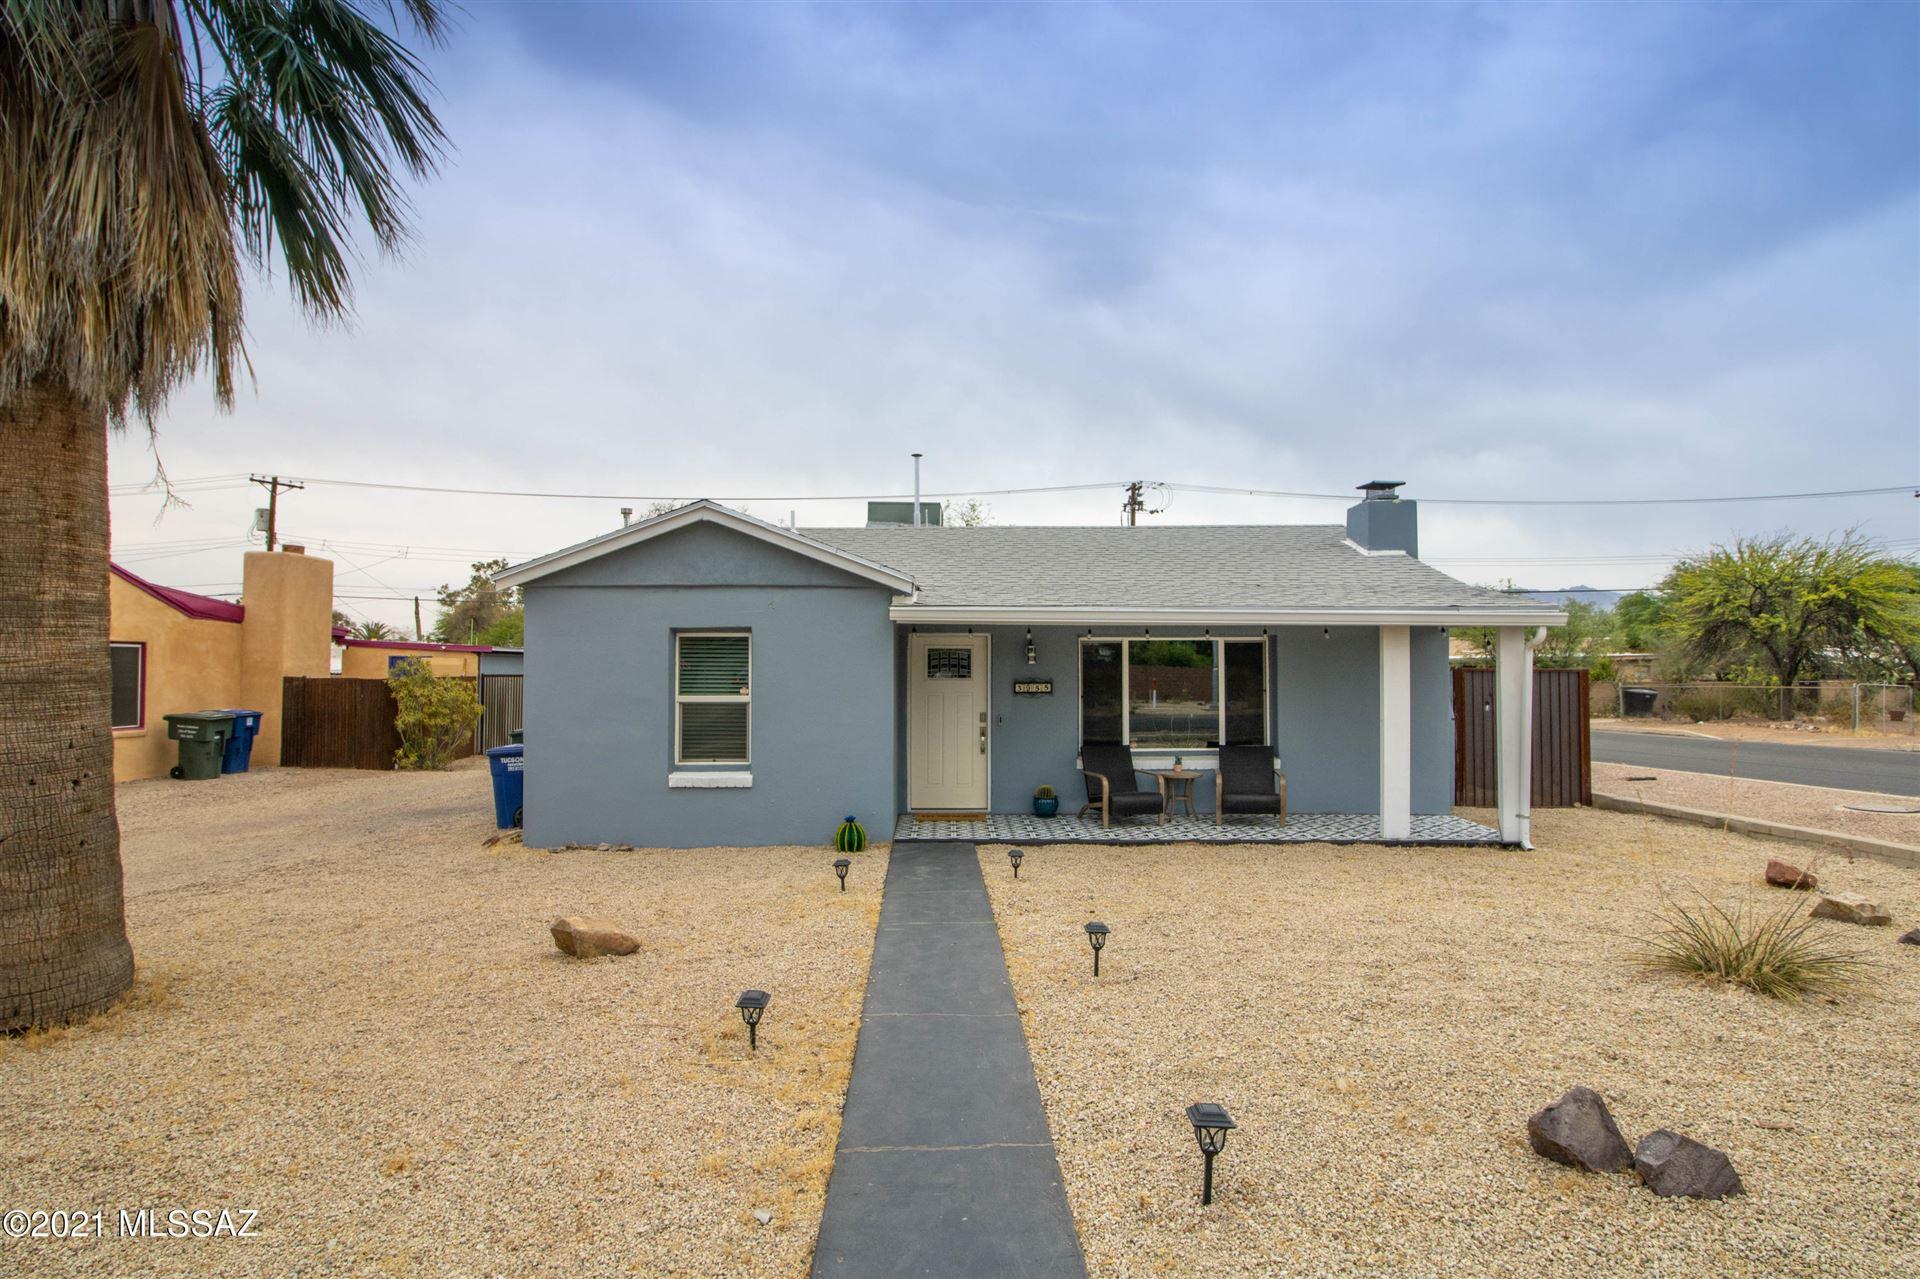 3955 E 2nd Street, Tucson, AZ 85711 - MLS#: 22116381